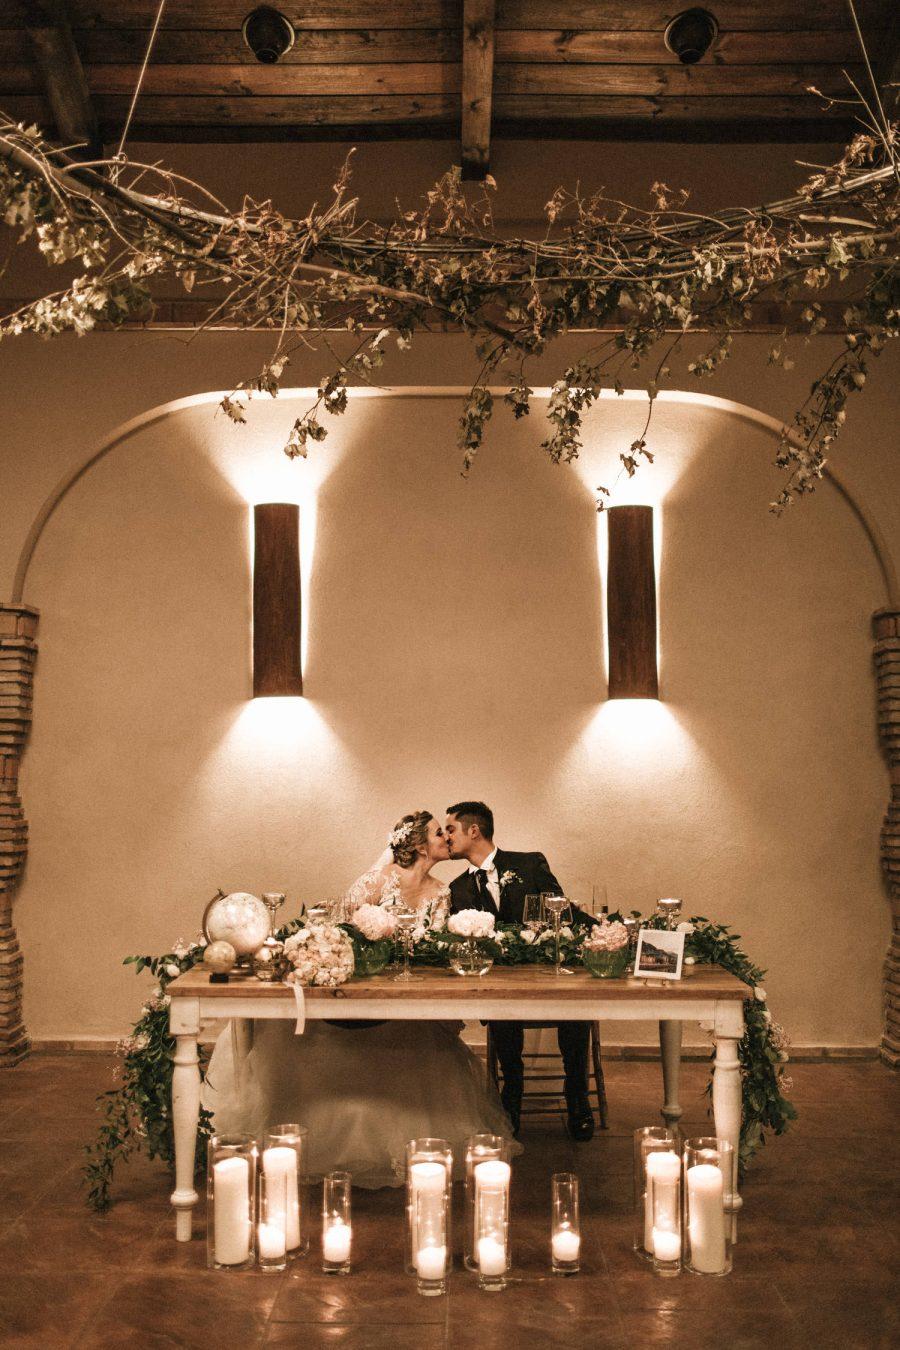 alejandro-onieva-fotografo-boda-granada-novia-novias-vestido-novios-torredelrey-torre-del-rey-la-borraja-laborraja